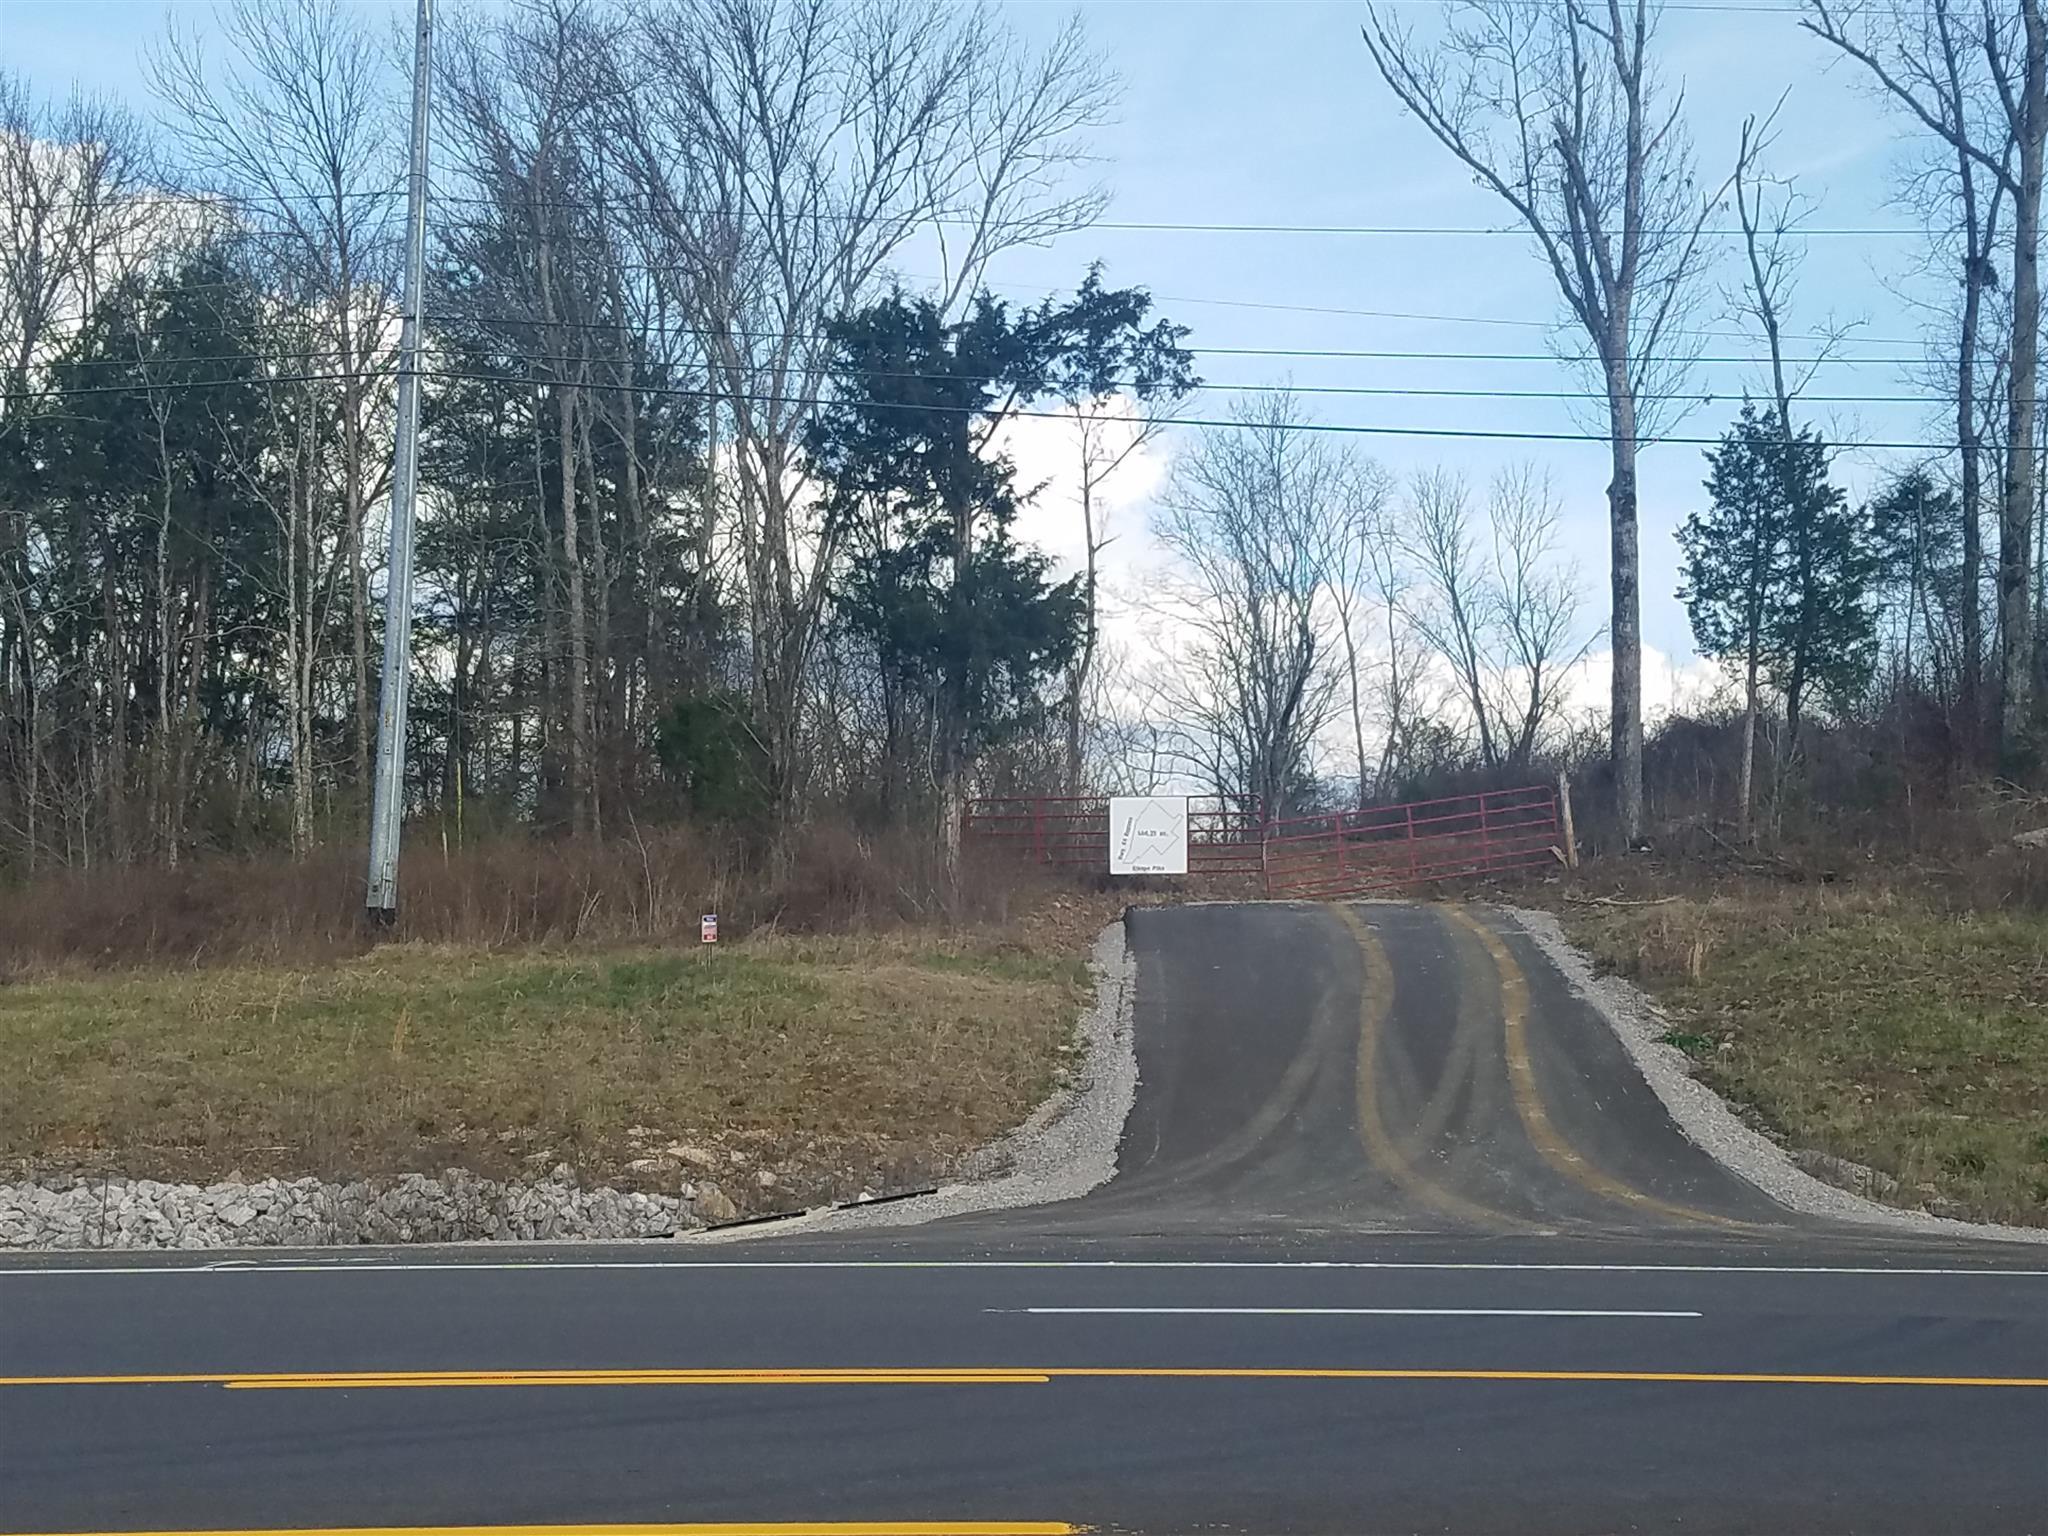 0 Highway 31 S & 64 By- Pass, Pulaski, TN 38478 - Pulaski, TN real estate listing